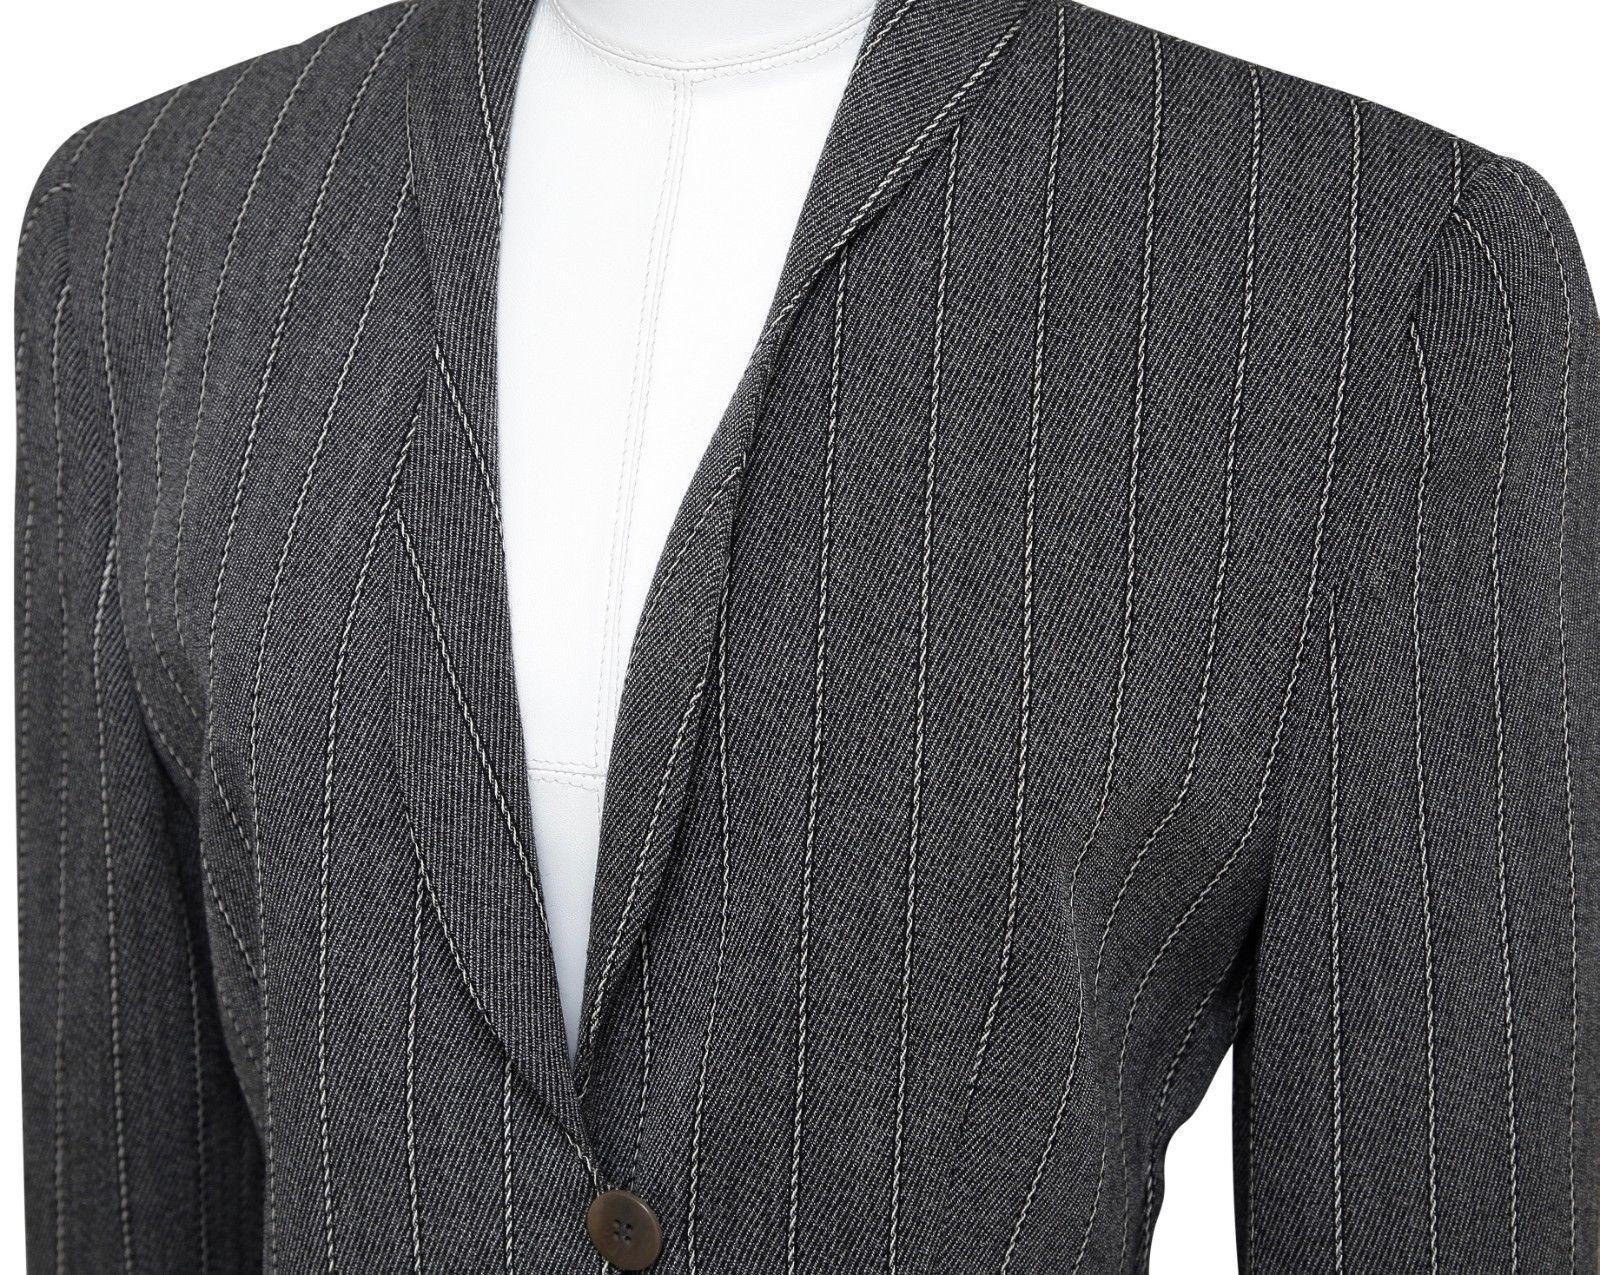 GIORGIO ARMANI Blazer Jacket Pinstripe Grey Off White Shawl Lapel Sz 40